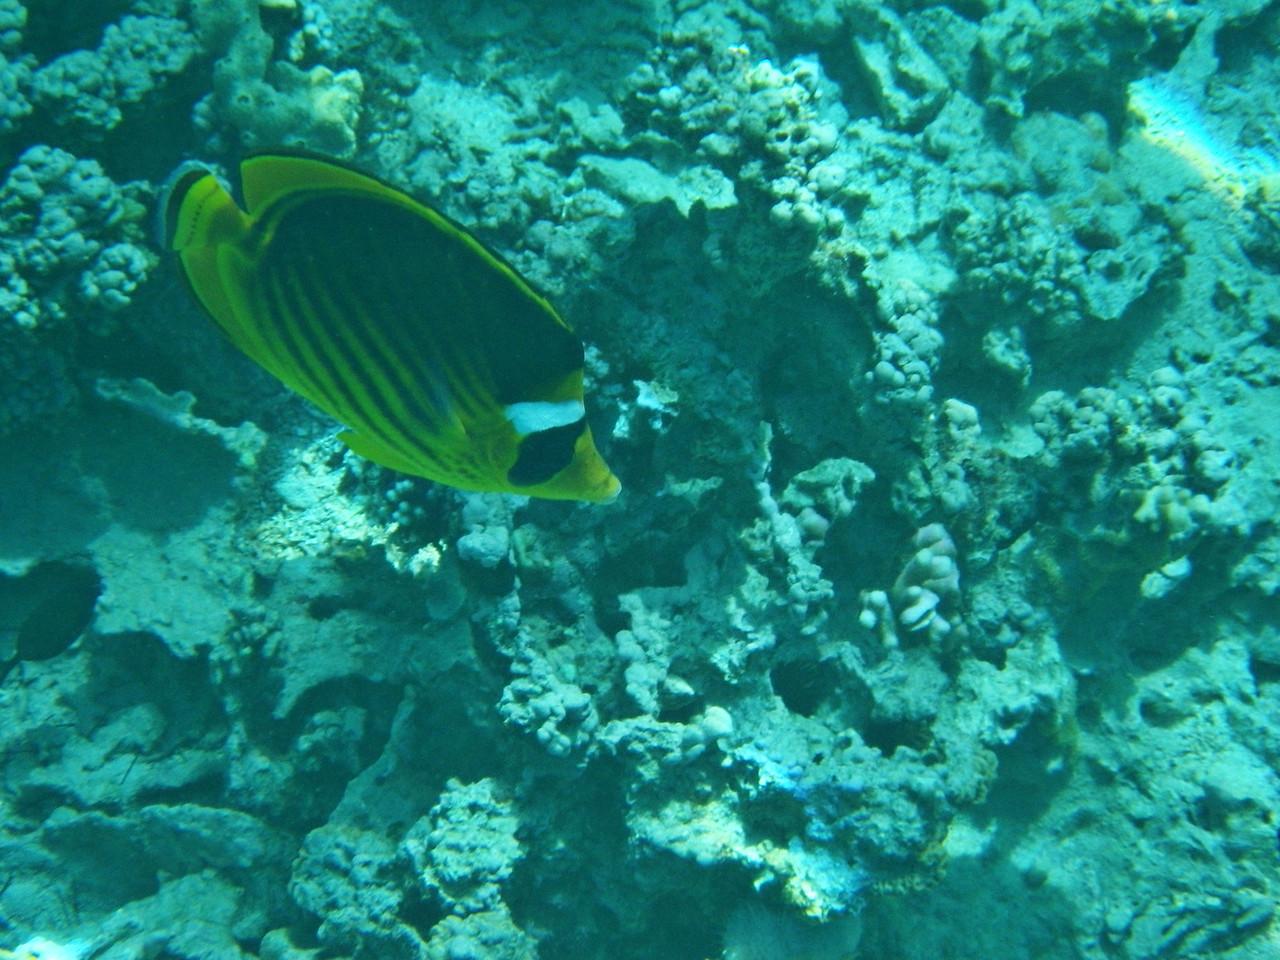 Snorkling i Röda havet